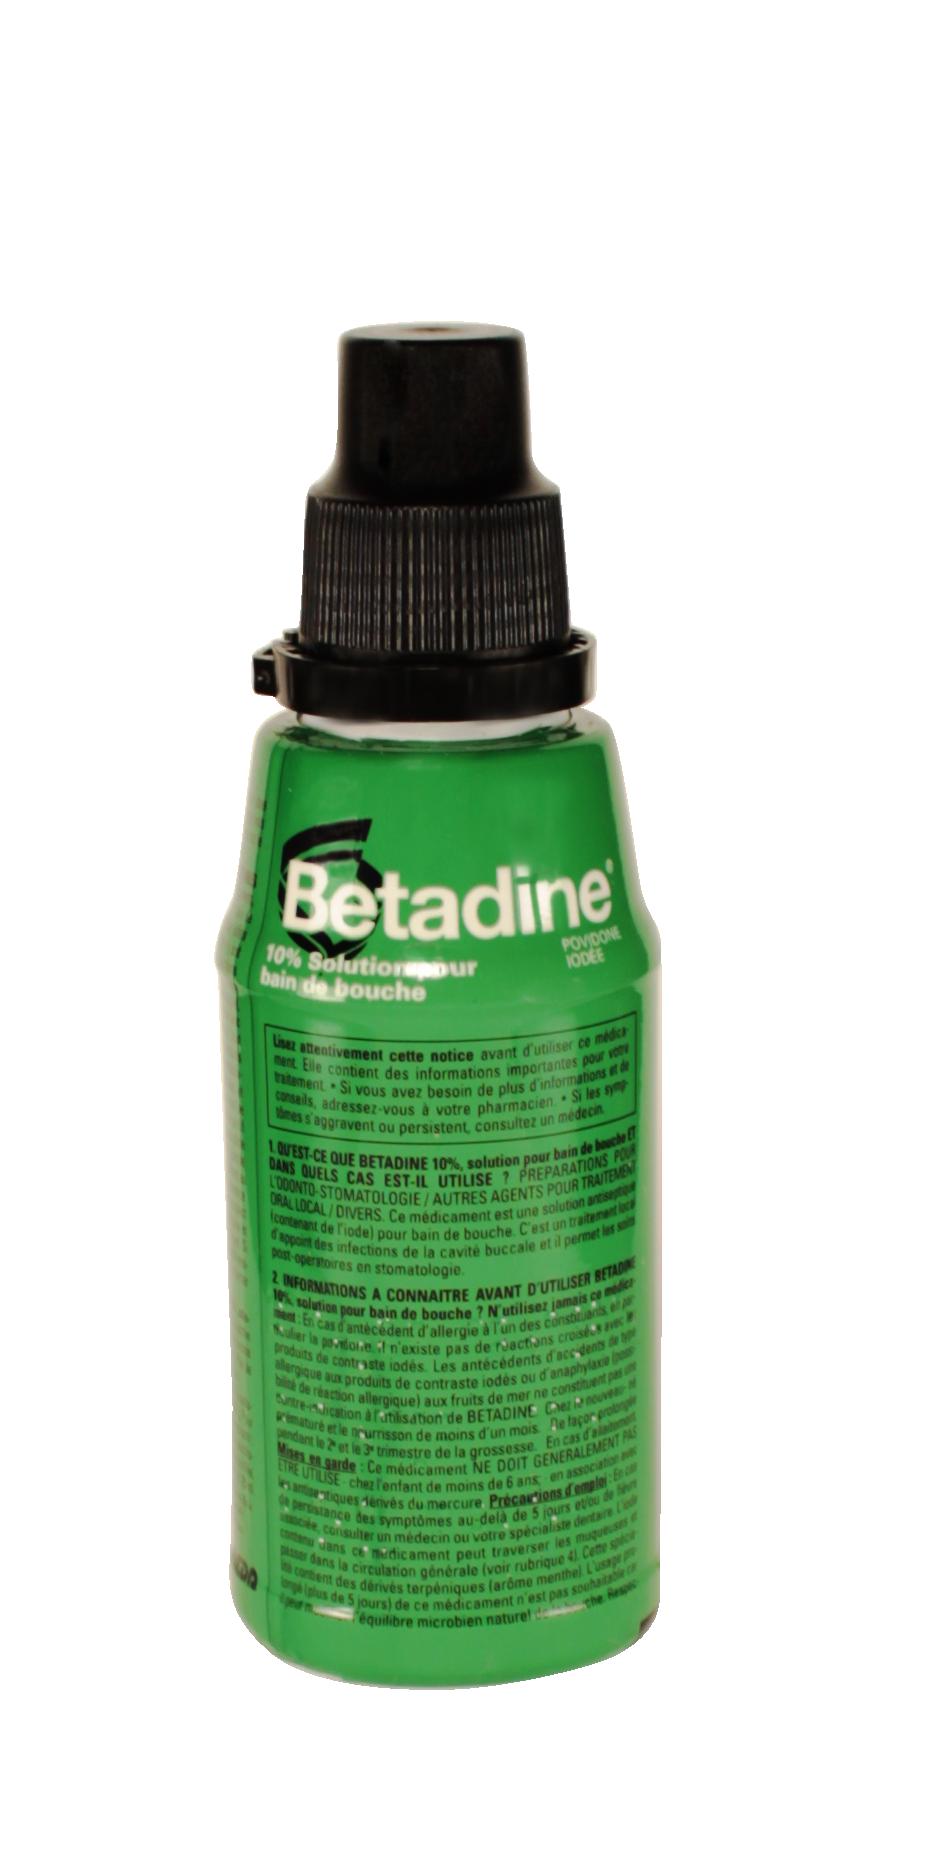 Betadine 10 m dicament bain de bouche antiseptique for Bain de bouche antiseptique maison